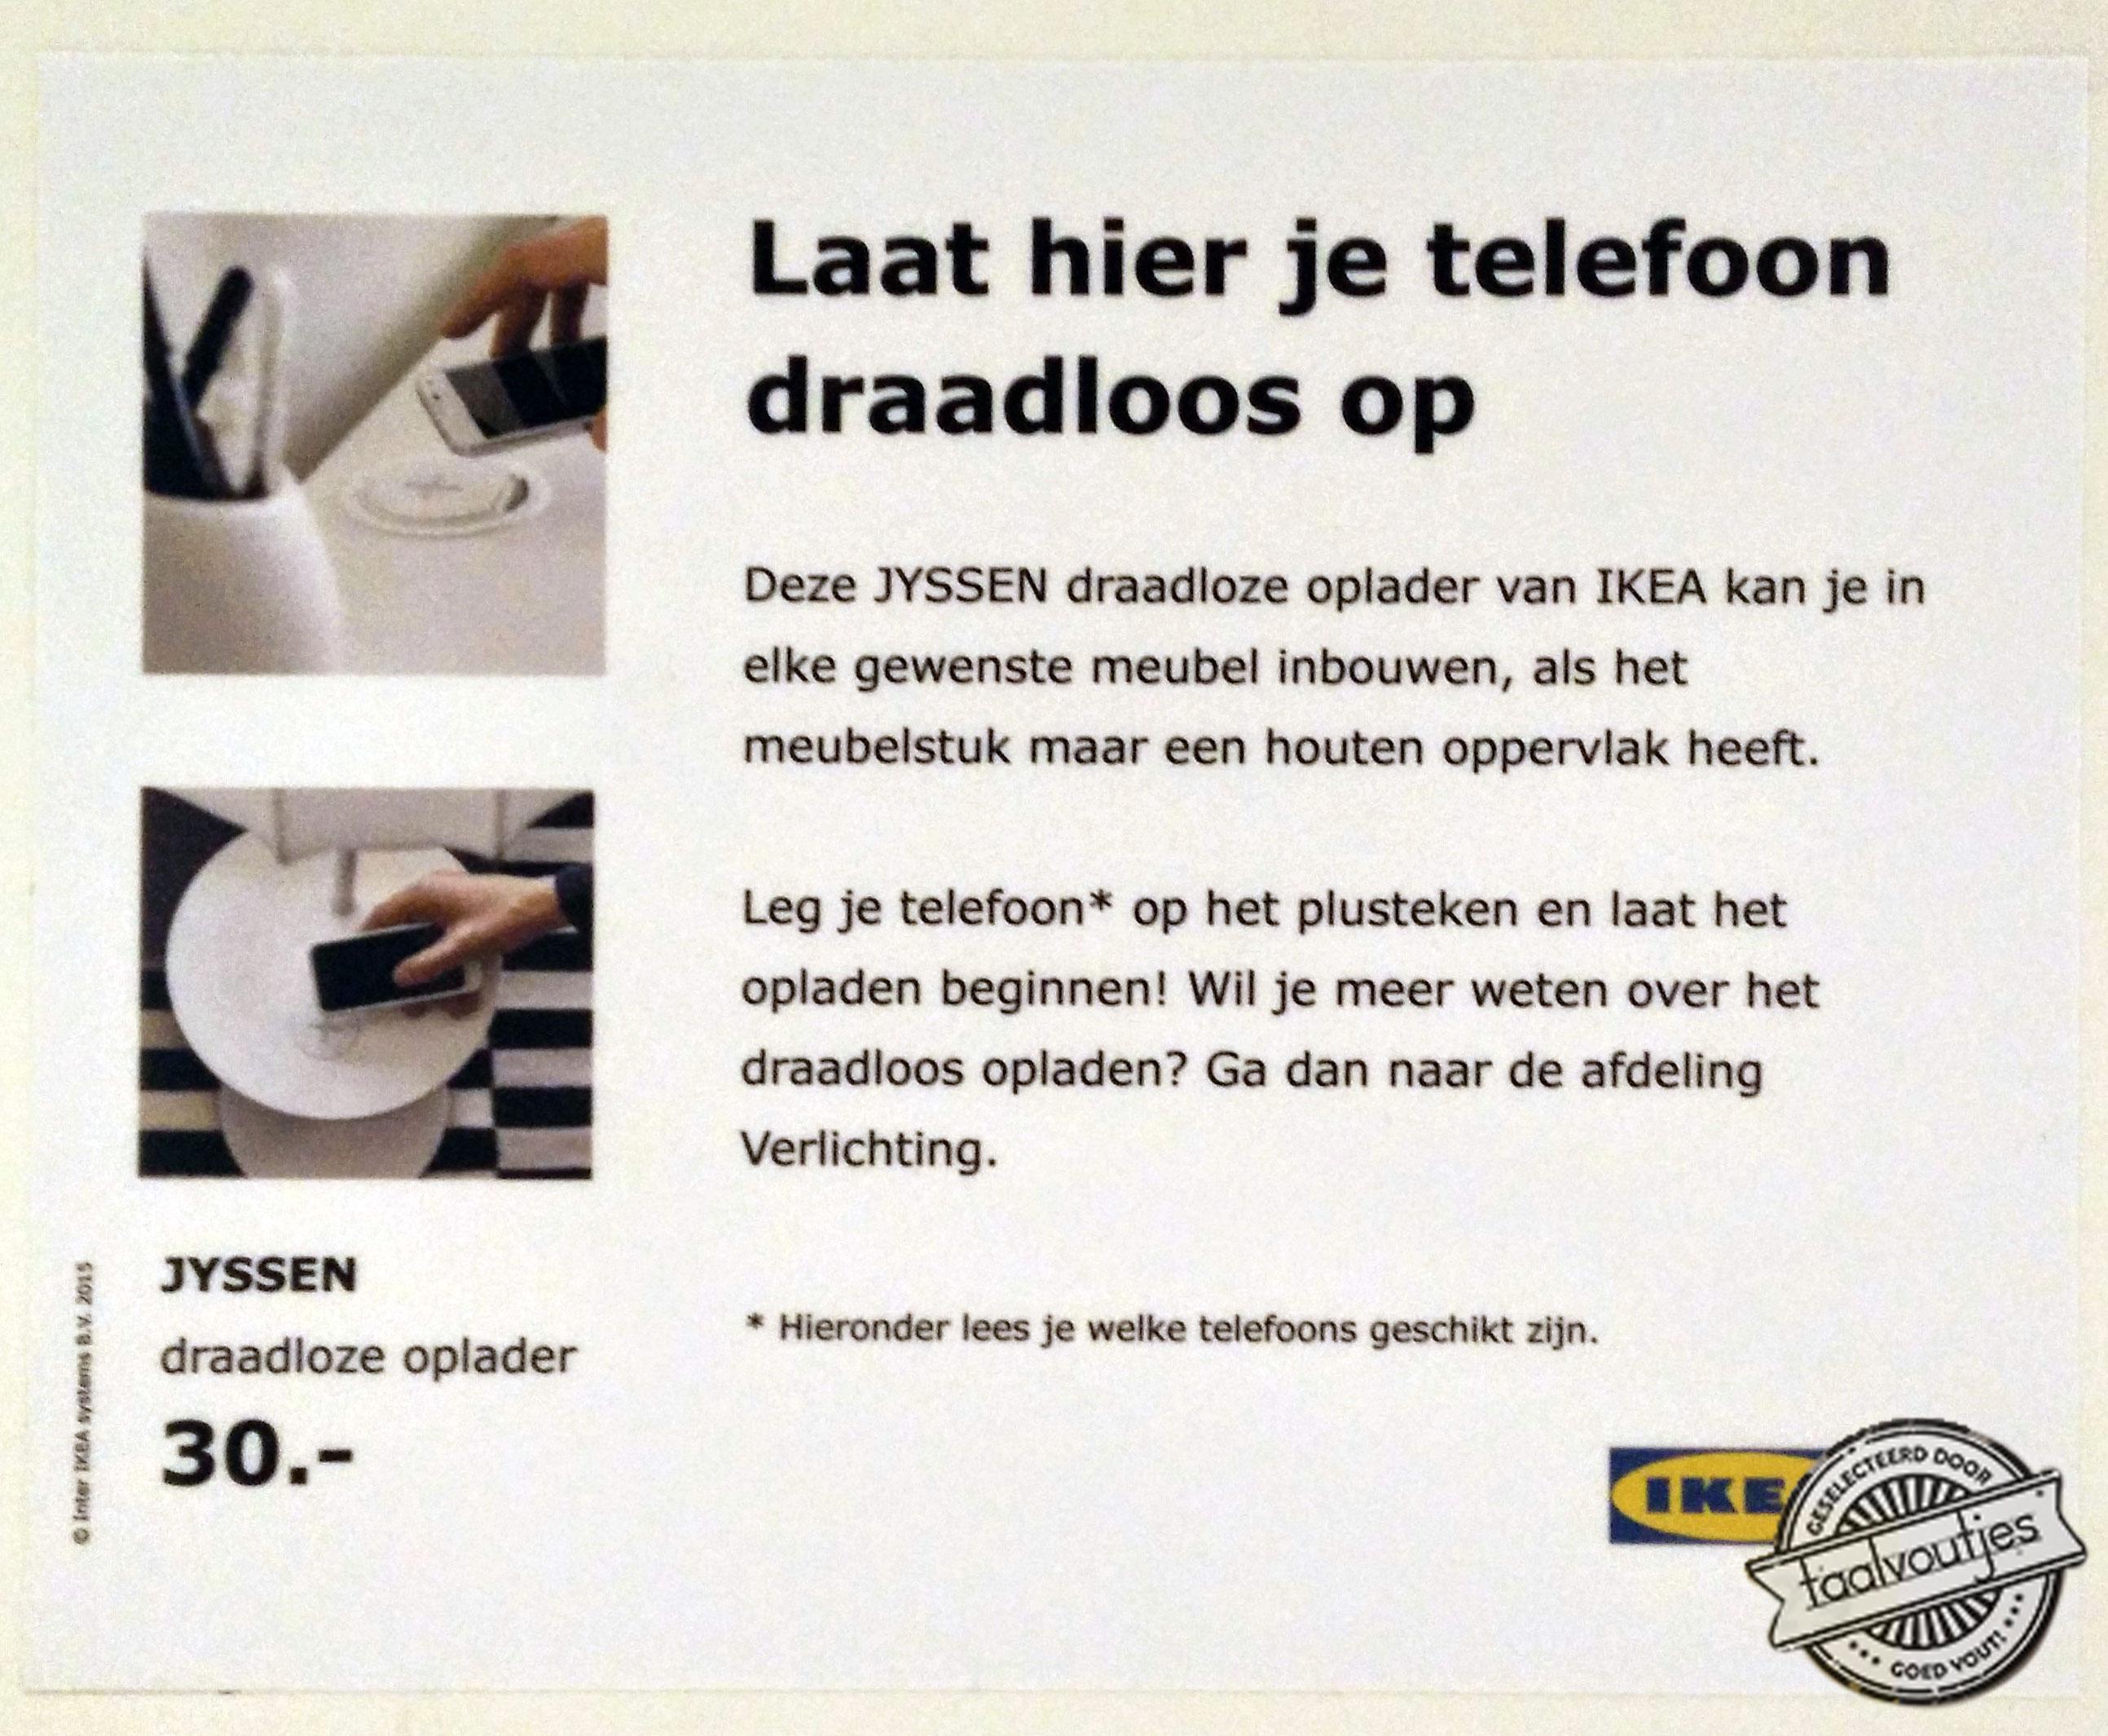 Laat je telefoon draadloos op bij Ikea